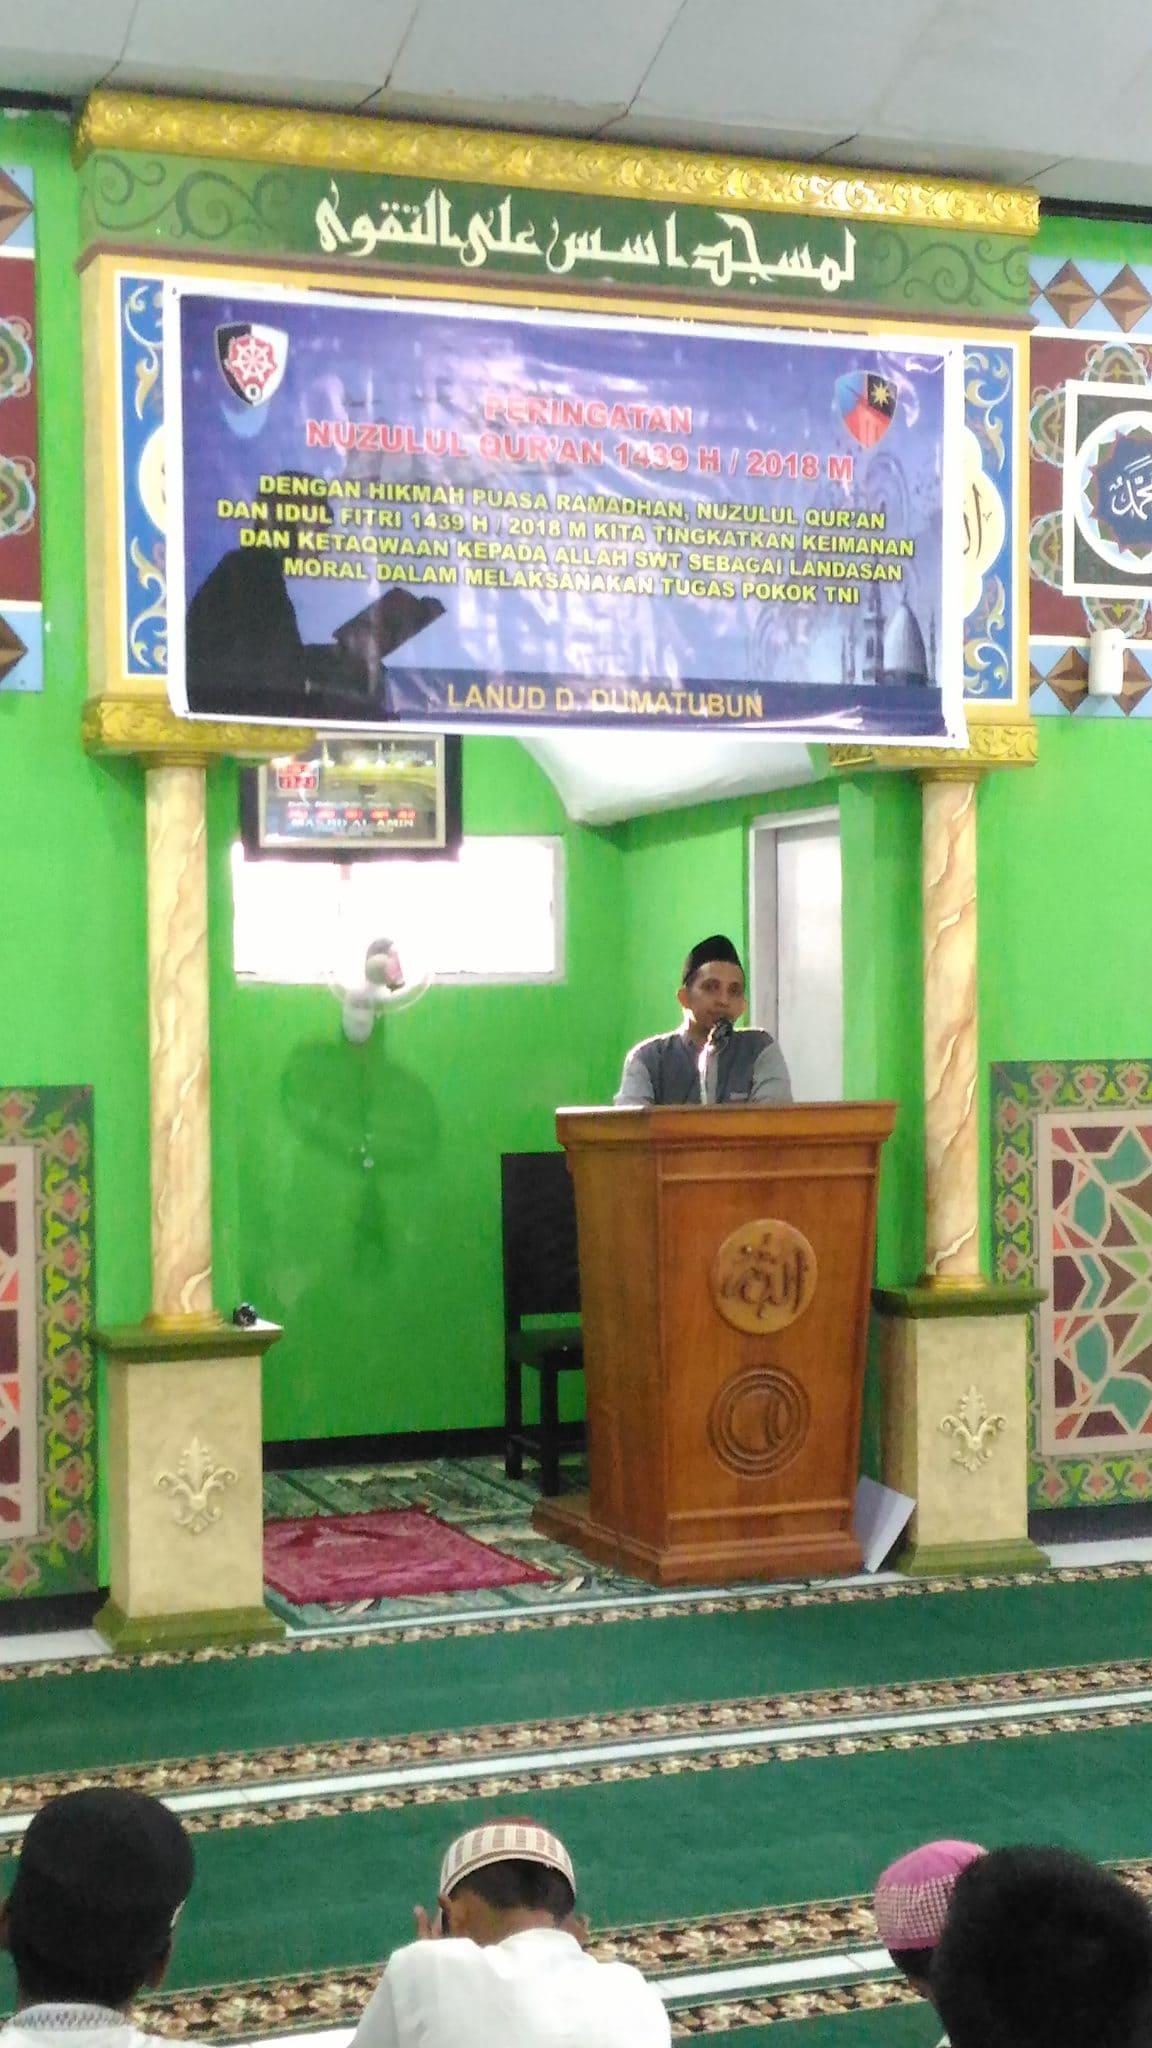 Memperingati Nuzulul Qur'an 1439 H /2018 M